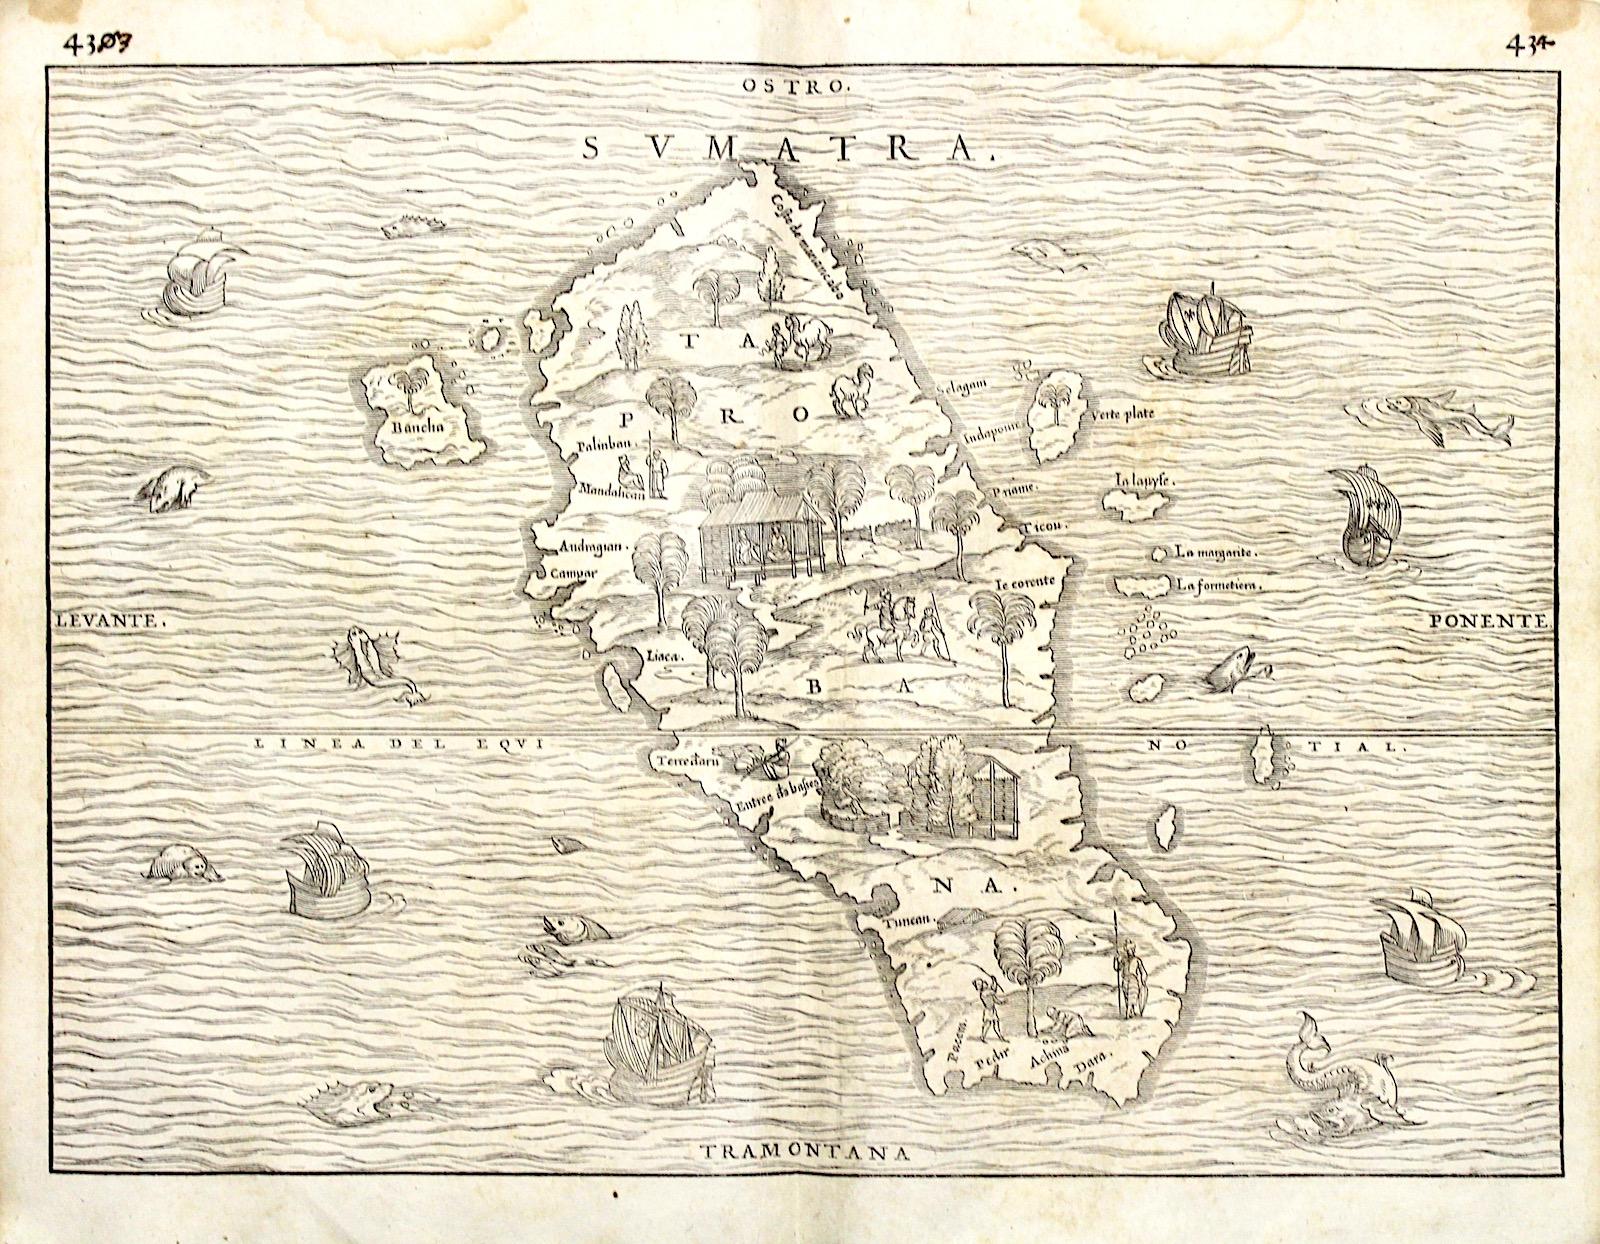 Map Of Upper Asia.Gastaldi Giacomo Ramusio Giovanni Battista Sumatra Taprobana